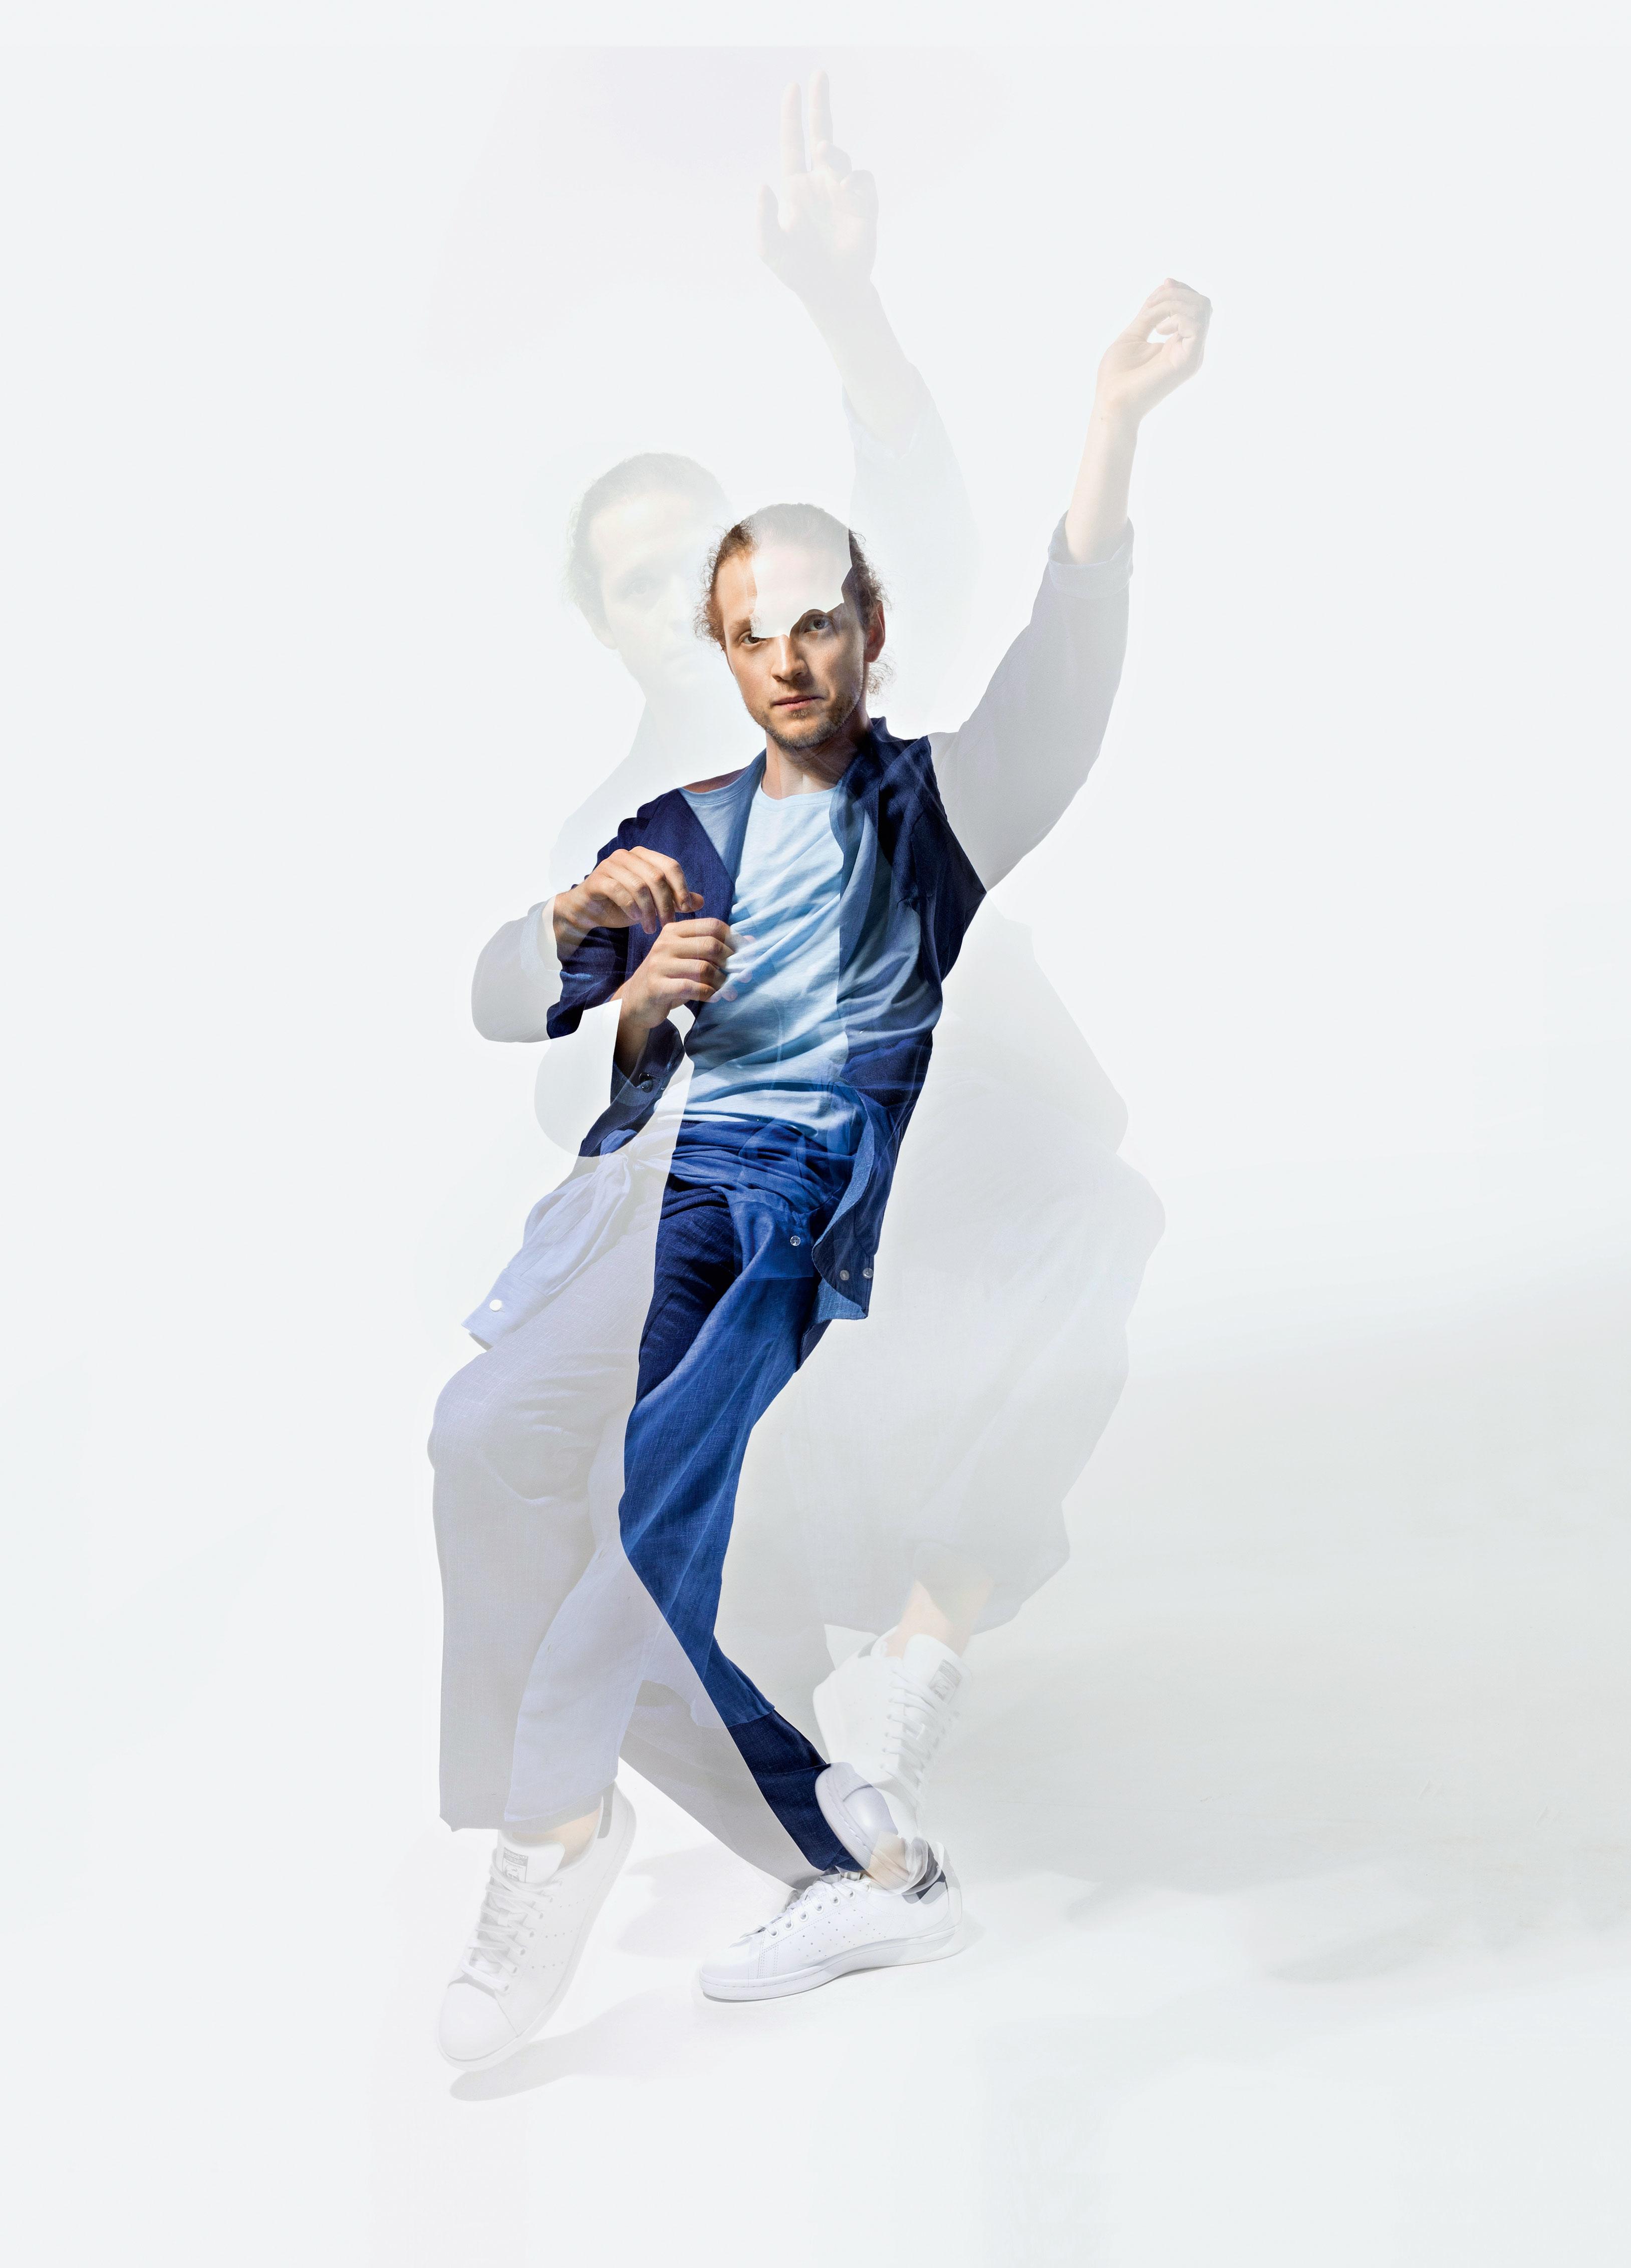 Костюм Atelier Portofino; футболка Henderson; рубашка Boss; кеды adidas Originals